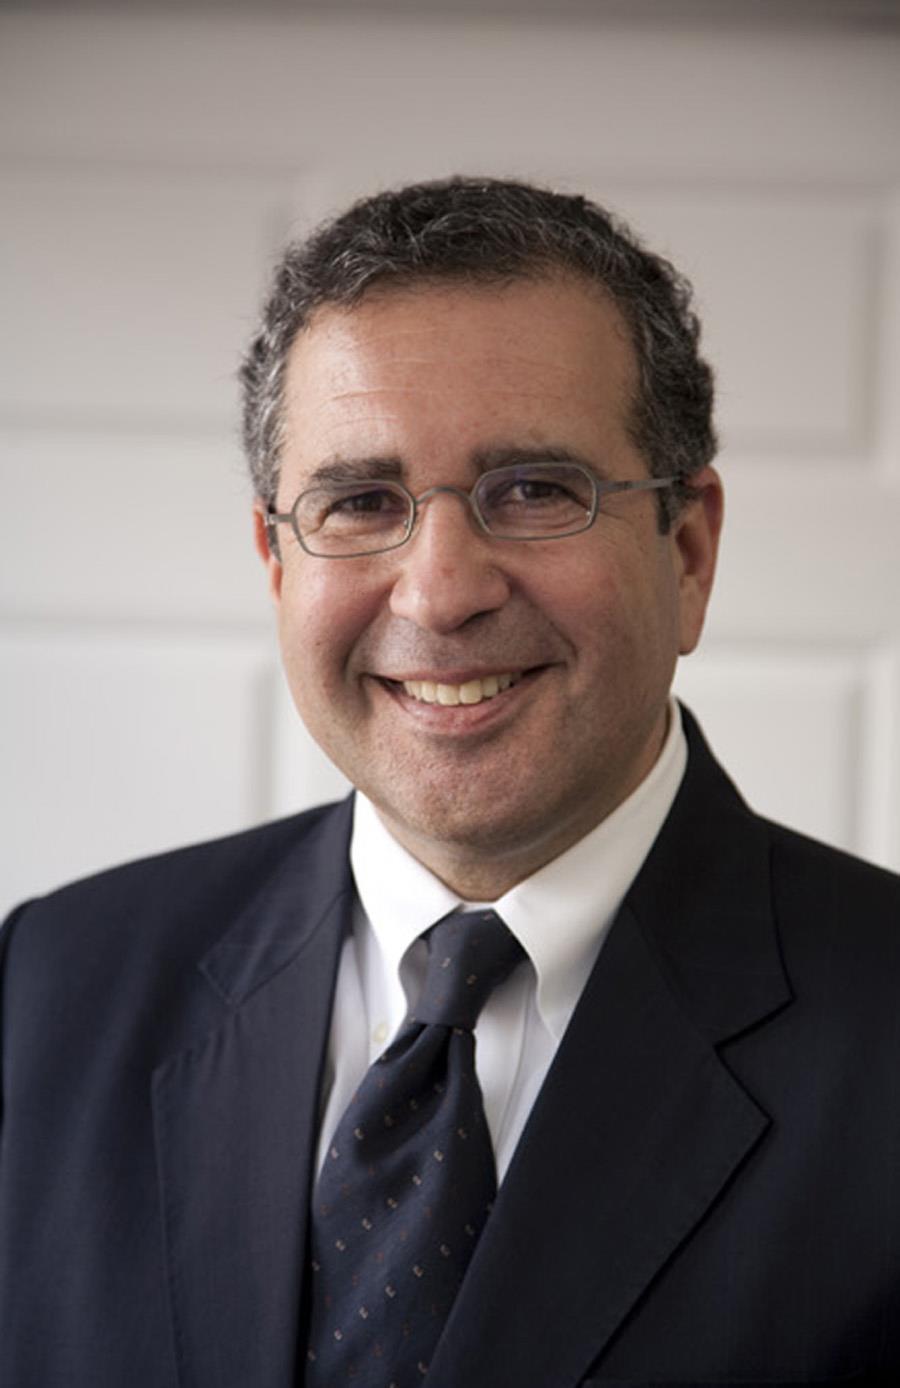 David Hafler